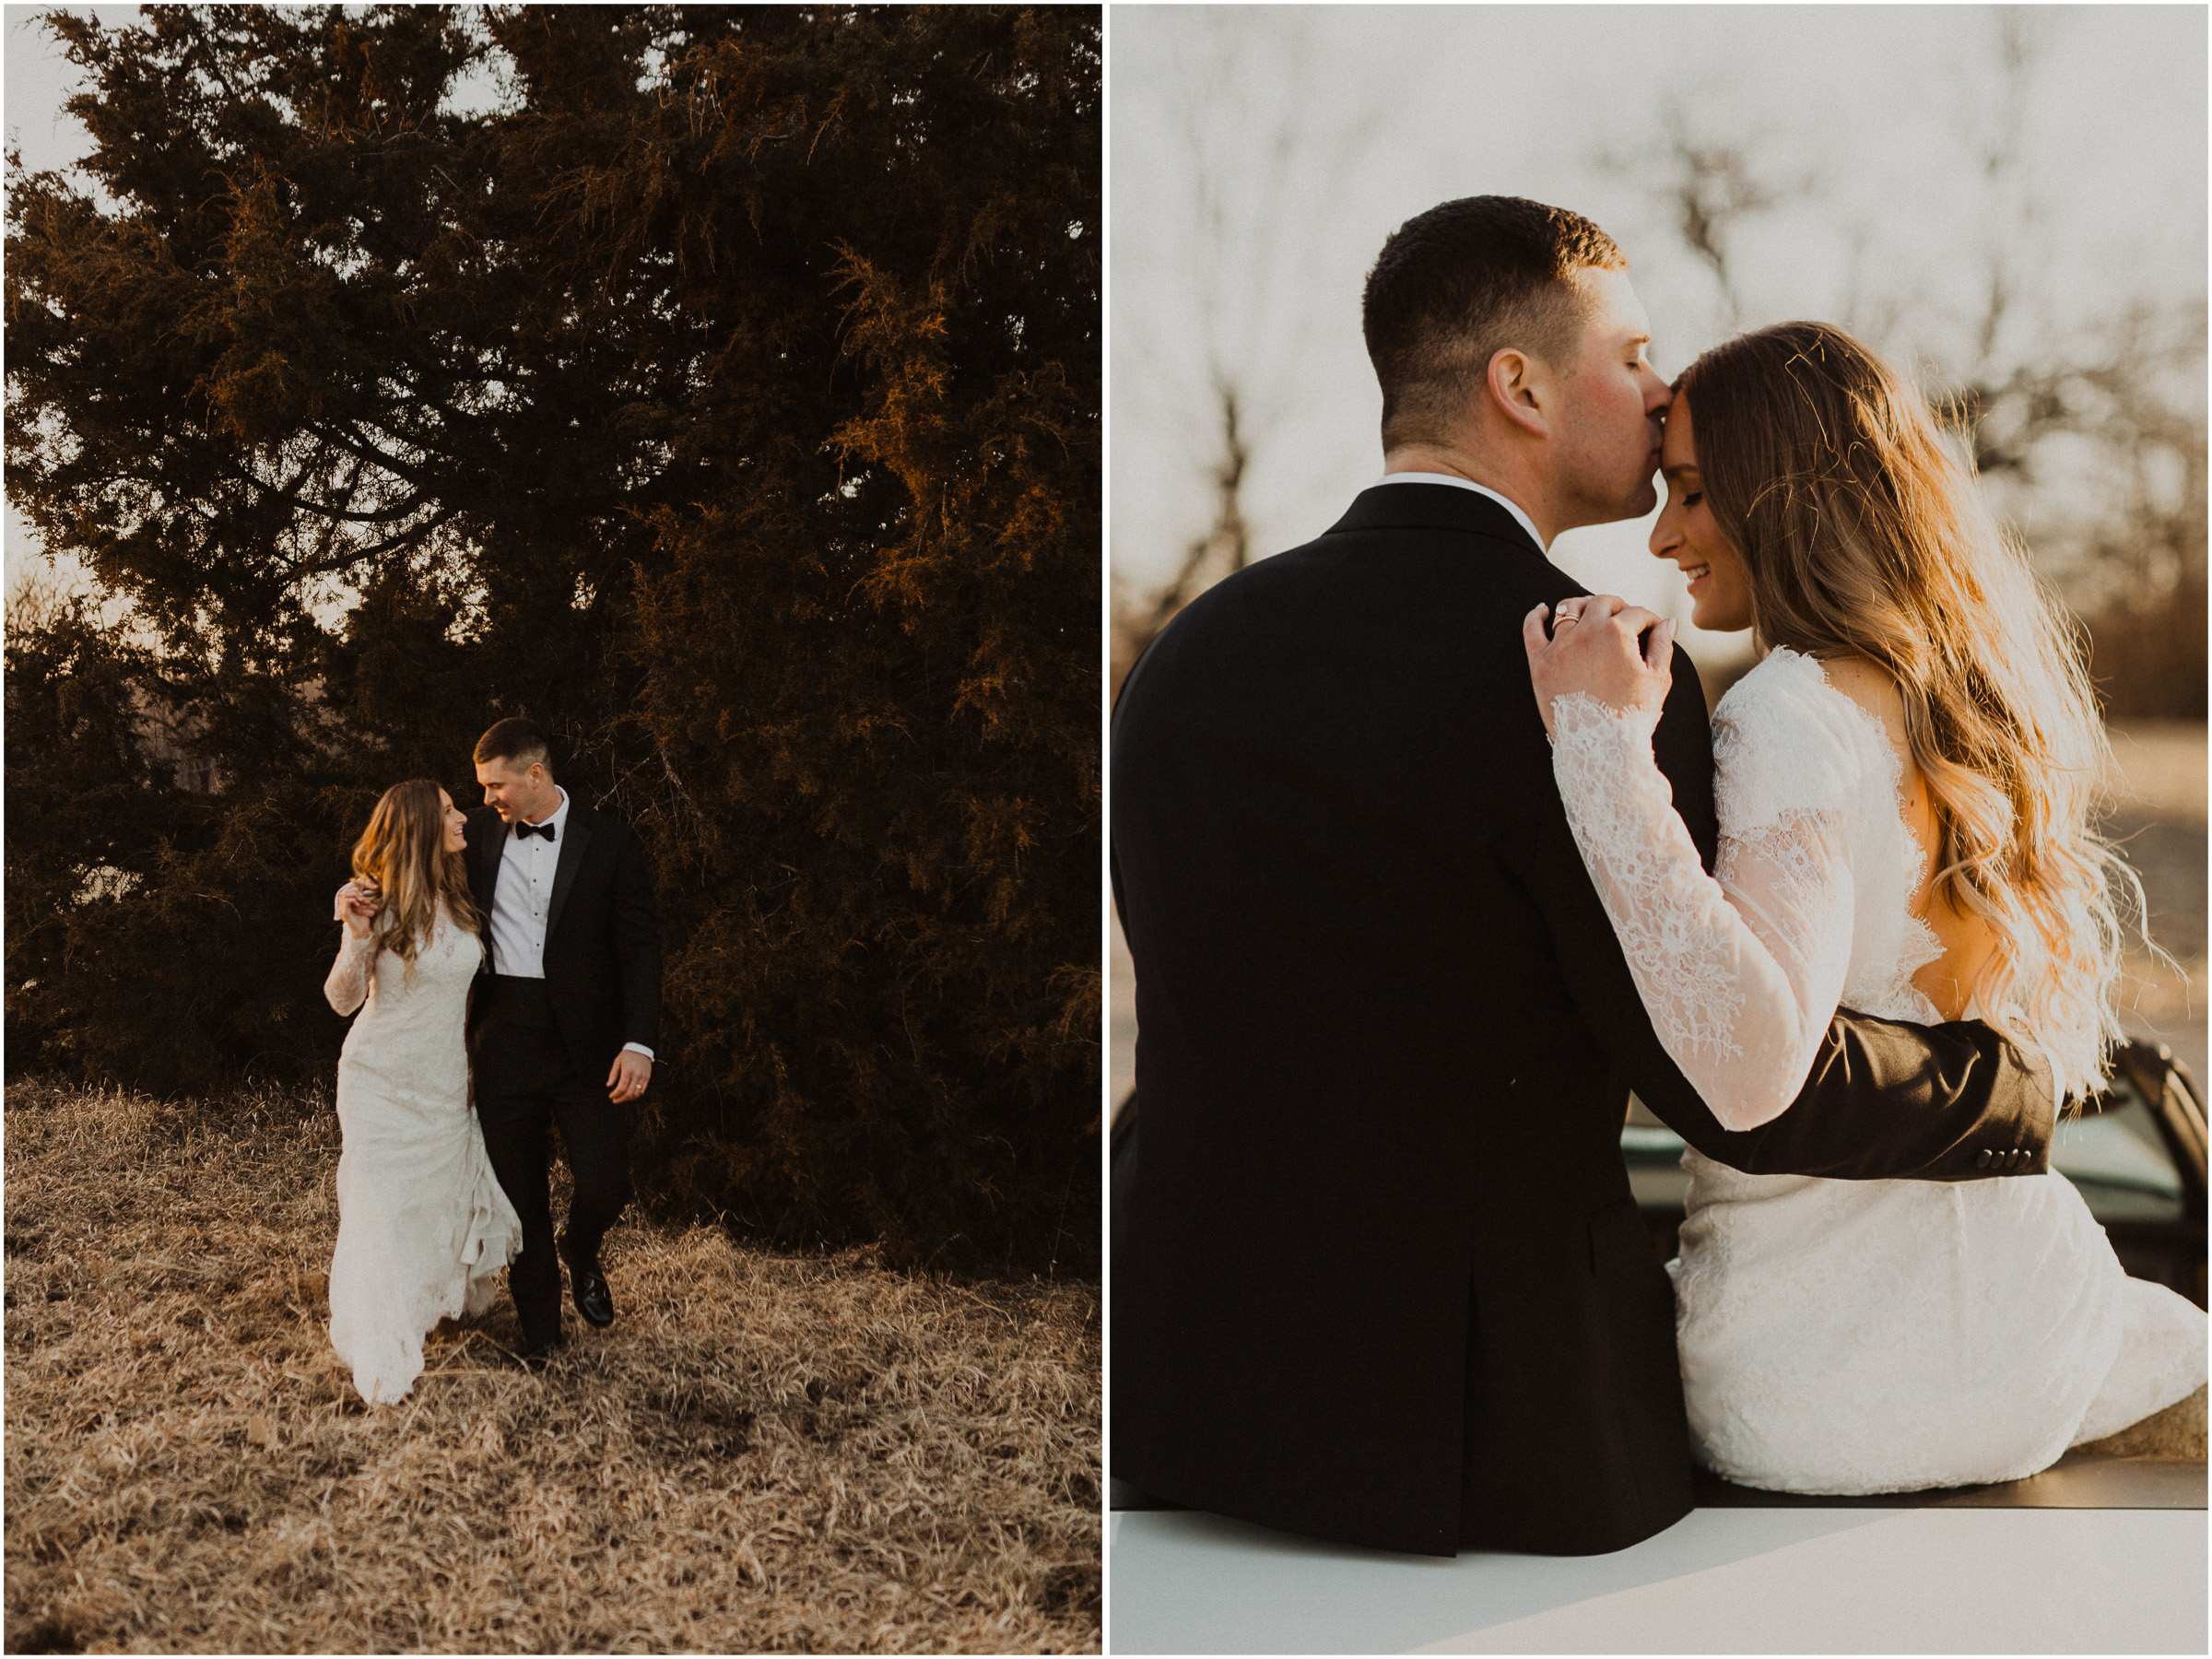 alyssa barletter photography shawnee mission park winter wedding 8th and main grandview missouri photographer-12.jpg